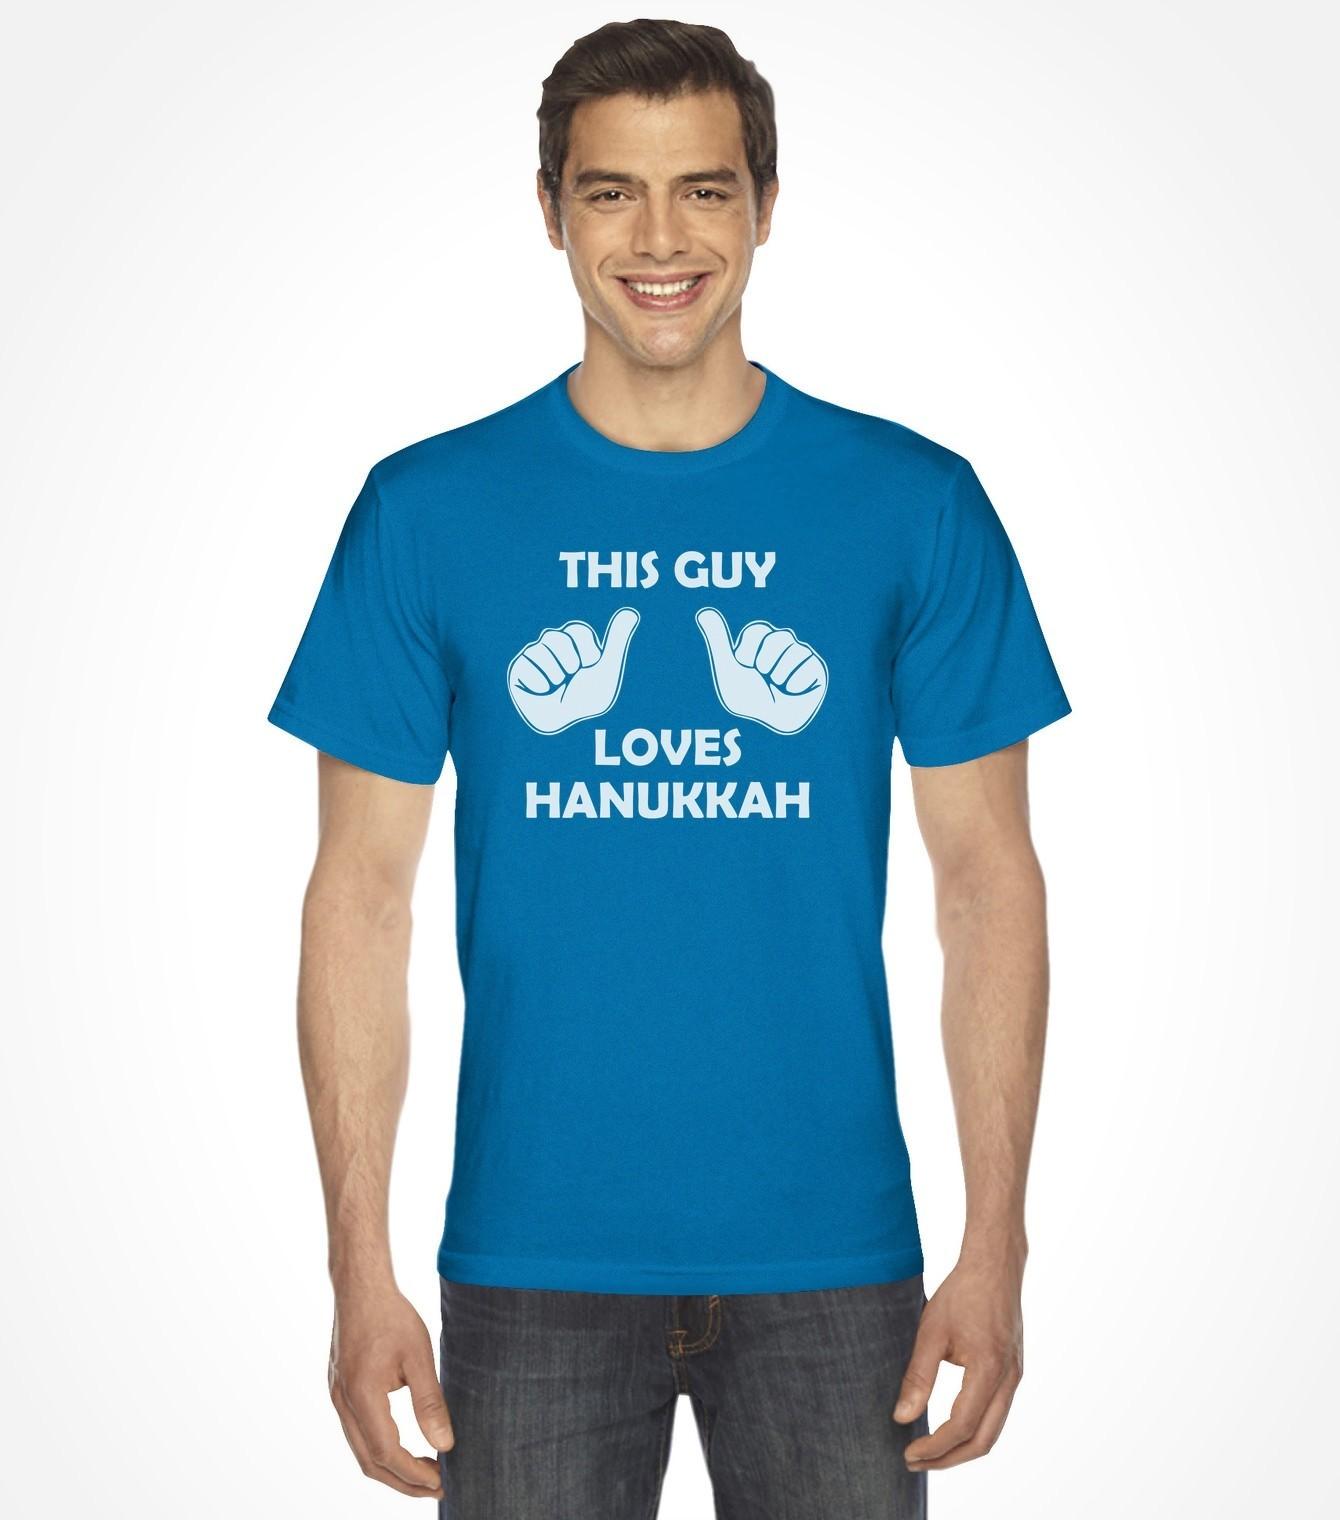 4b626da1fd This Guy Loves Hanukkah Funny Jewish Shirt - Israeli-T